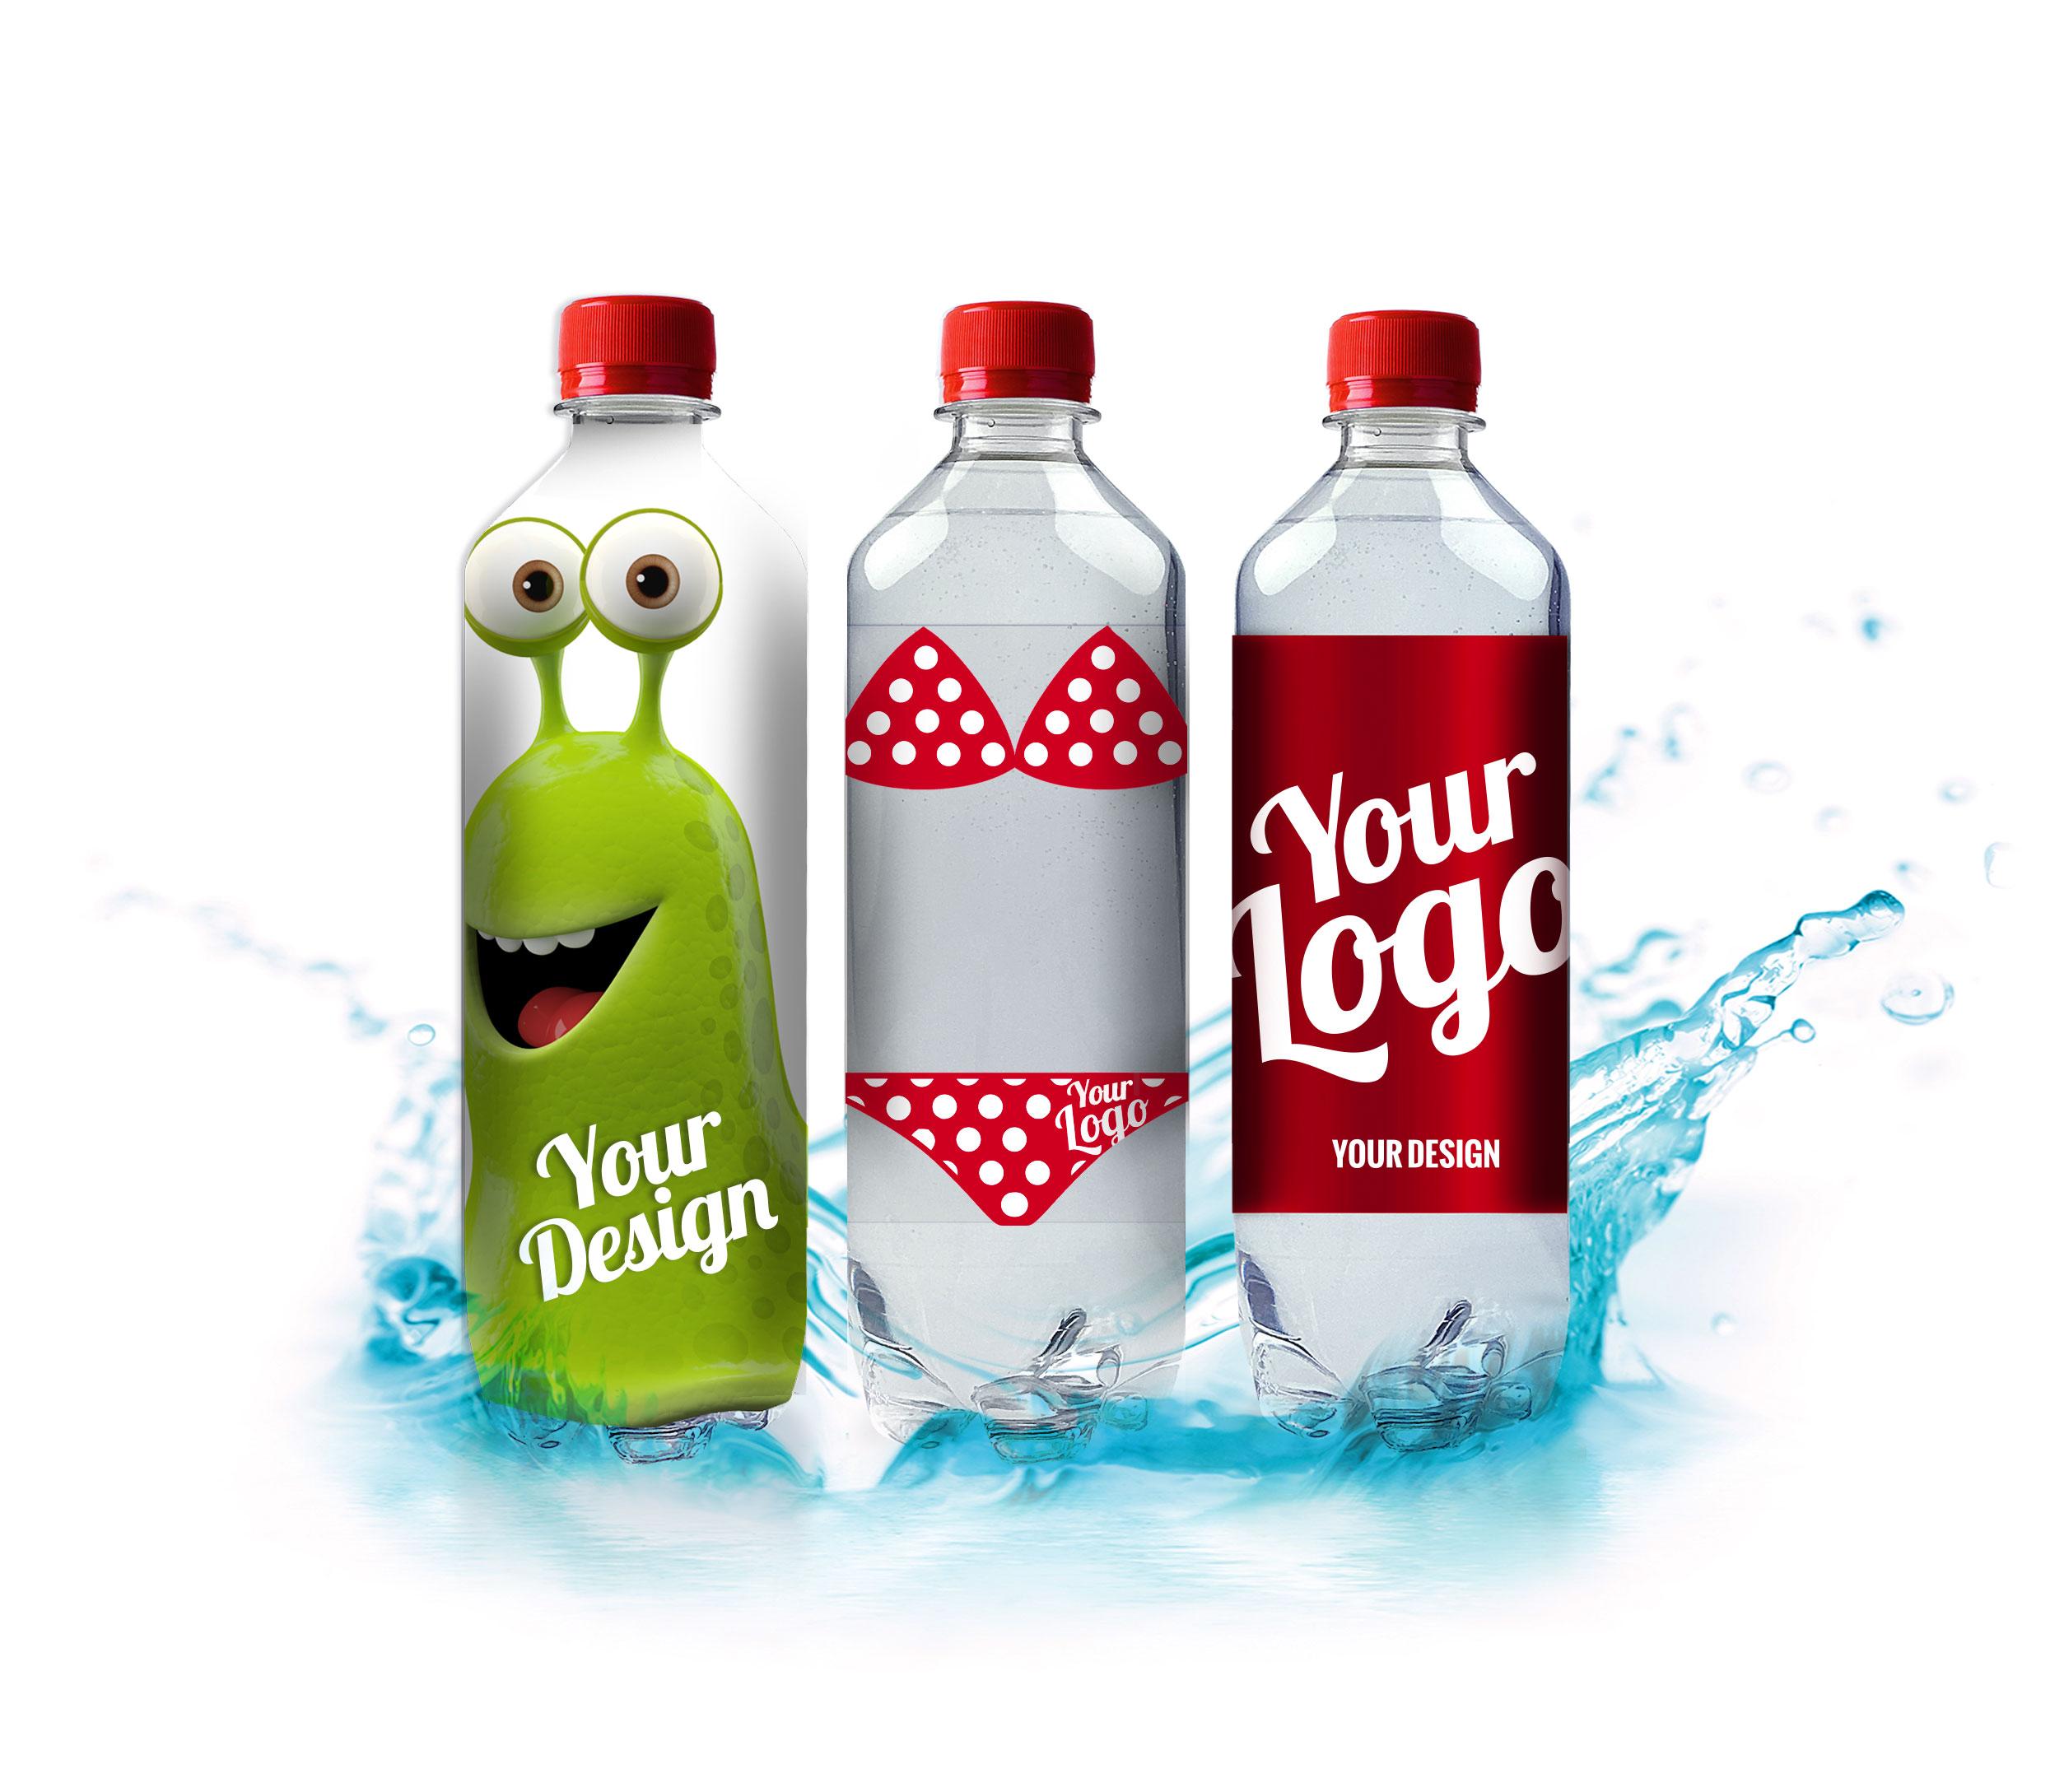 Advertising water from Aquadana Denmark